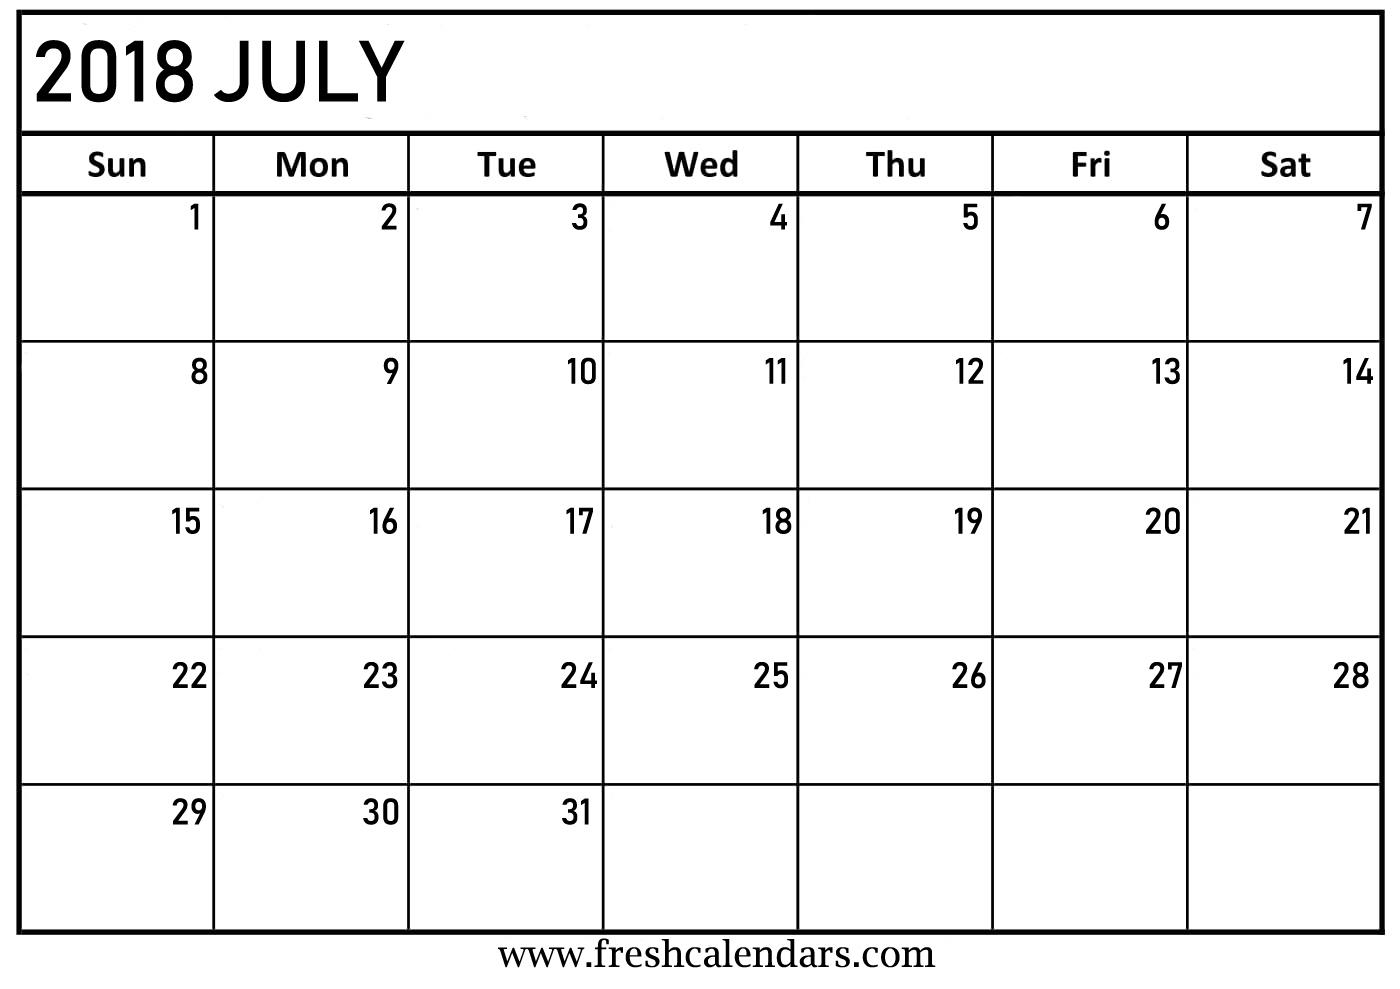 july 2018 free calendar